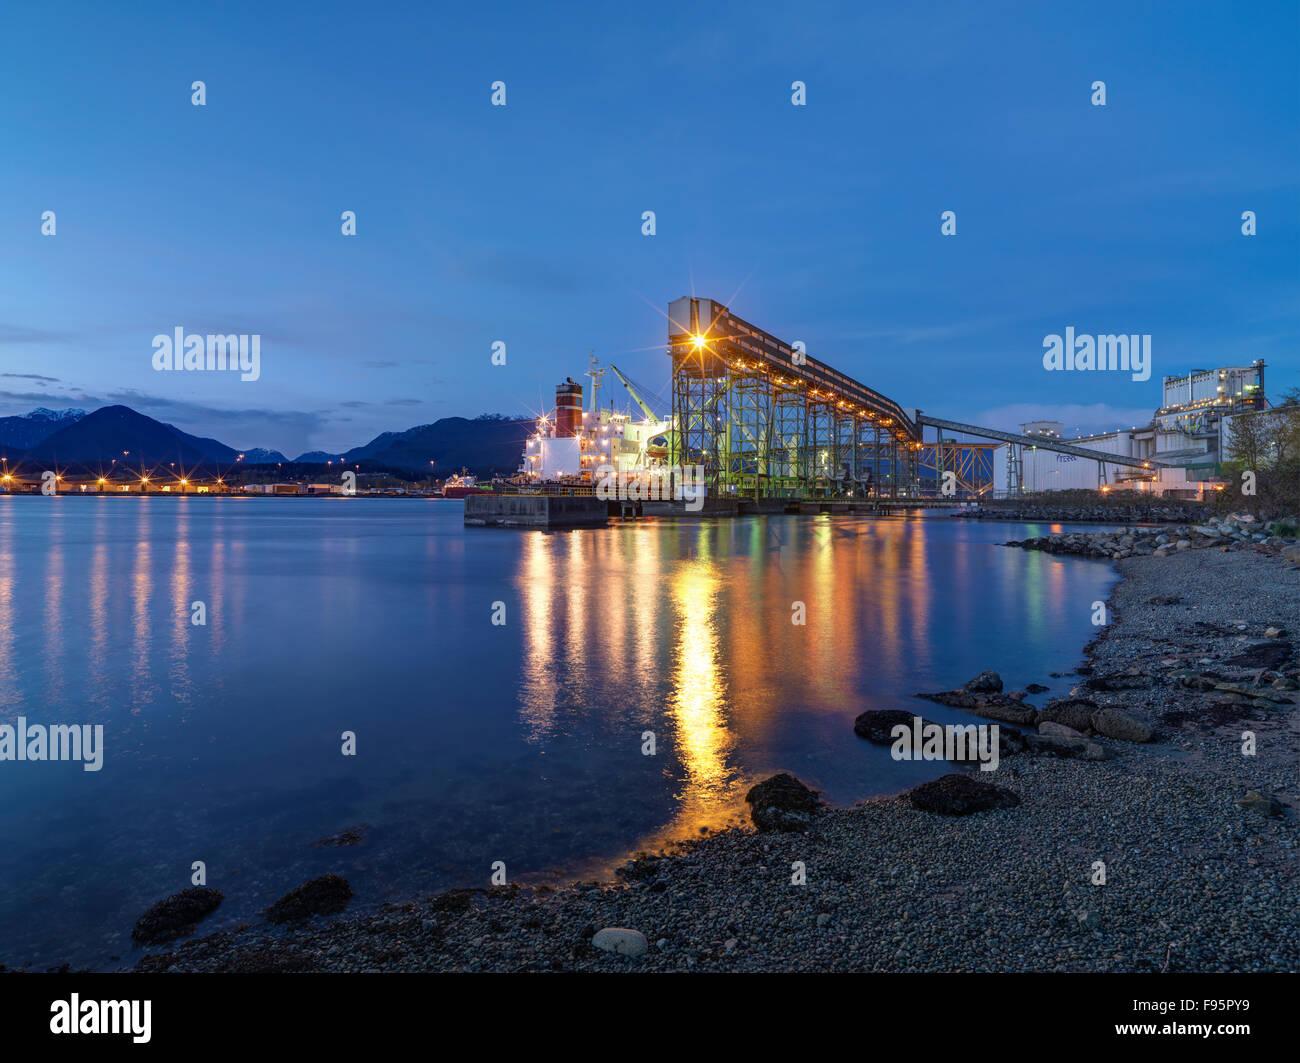 Loading docks. - Stock Image